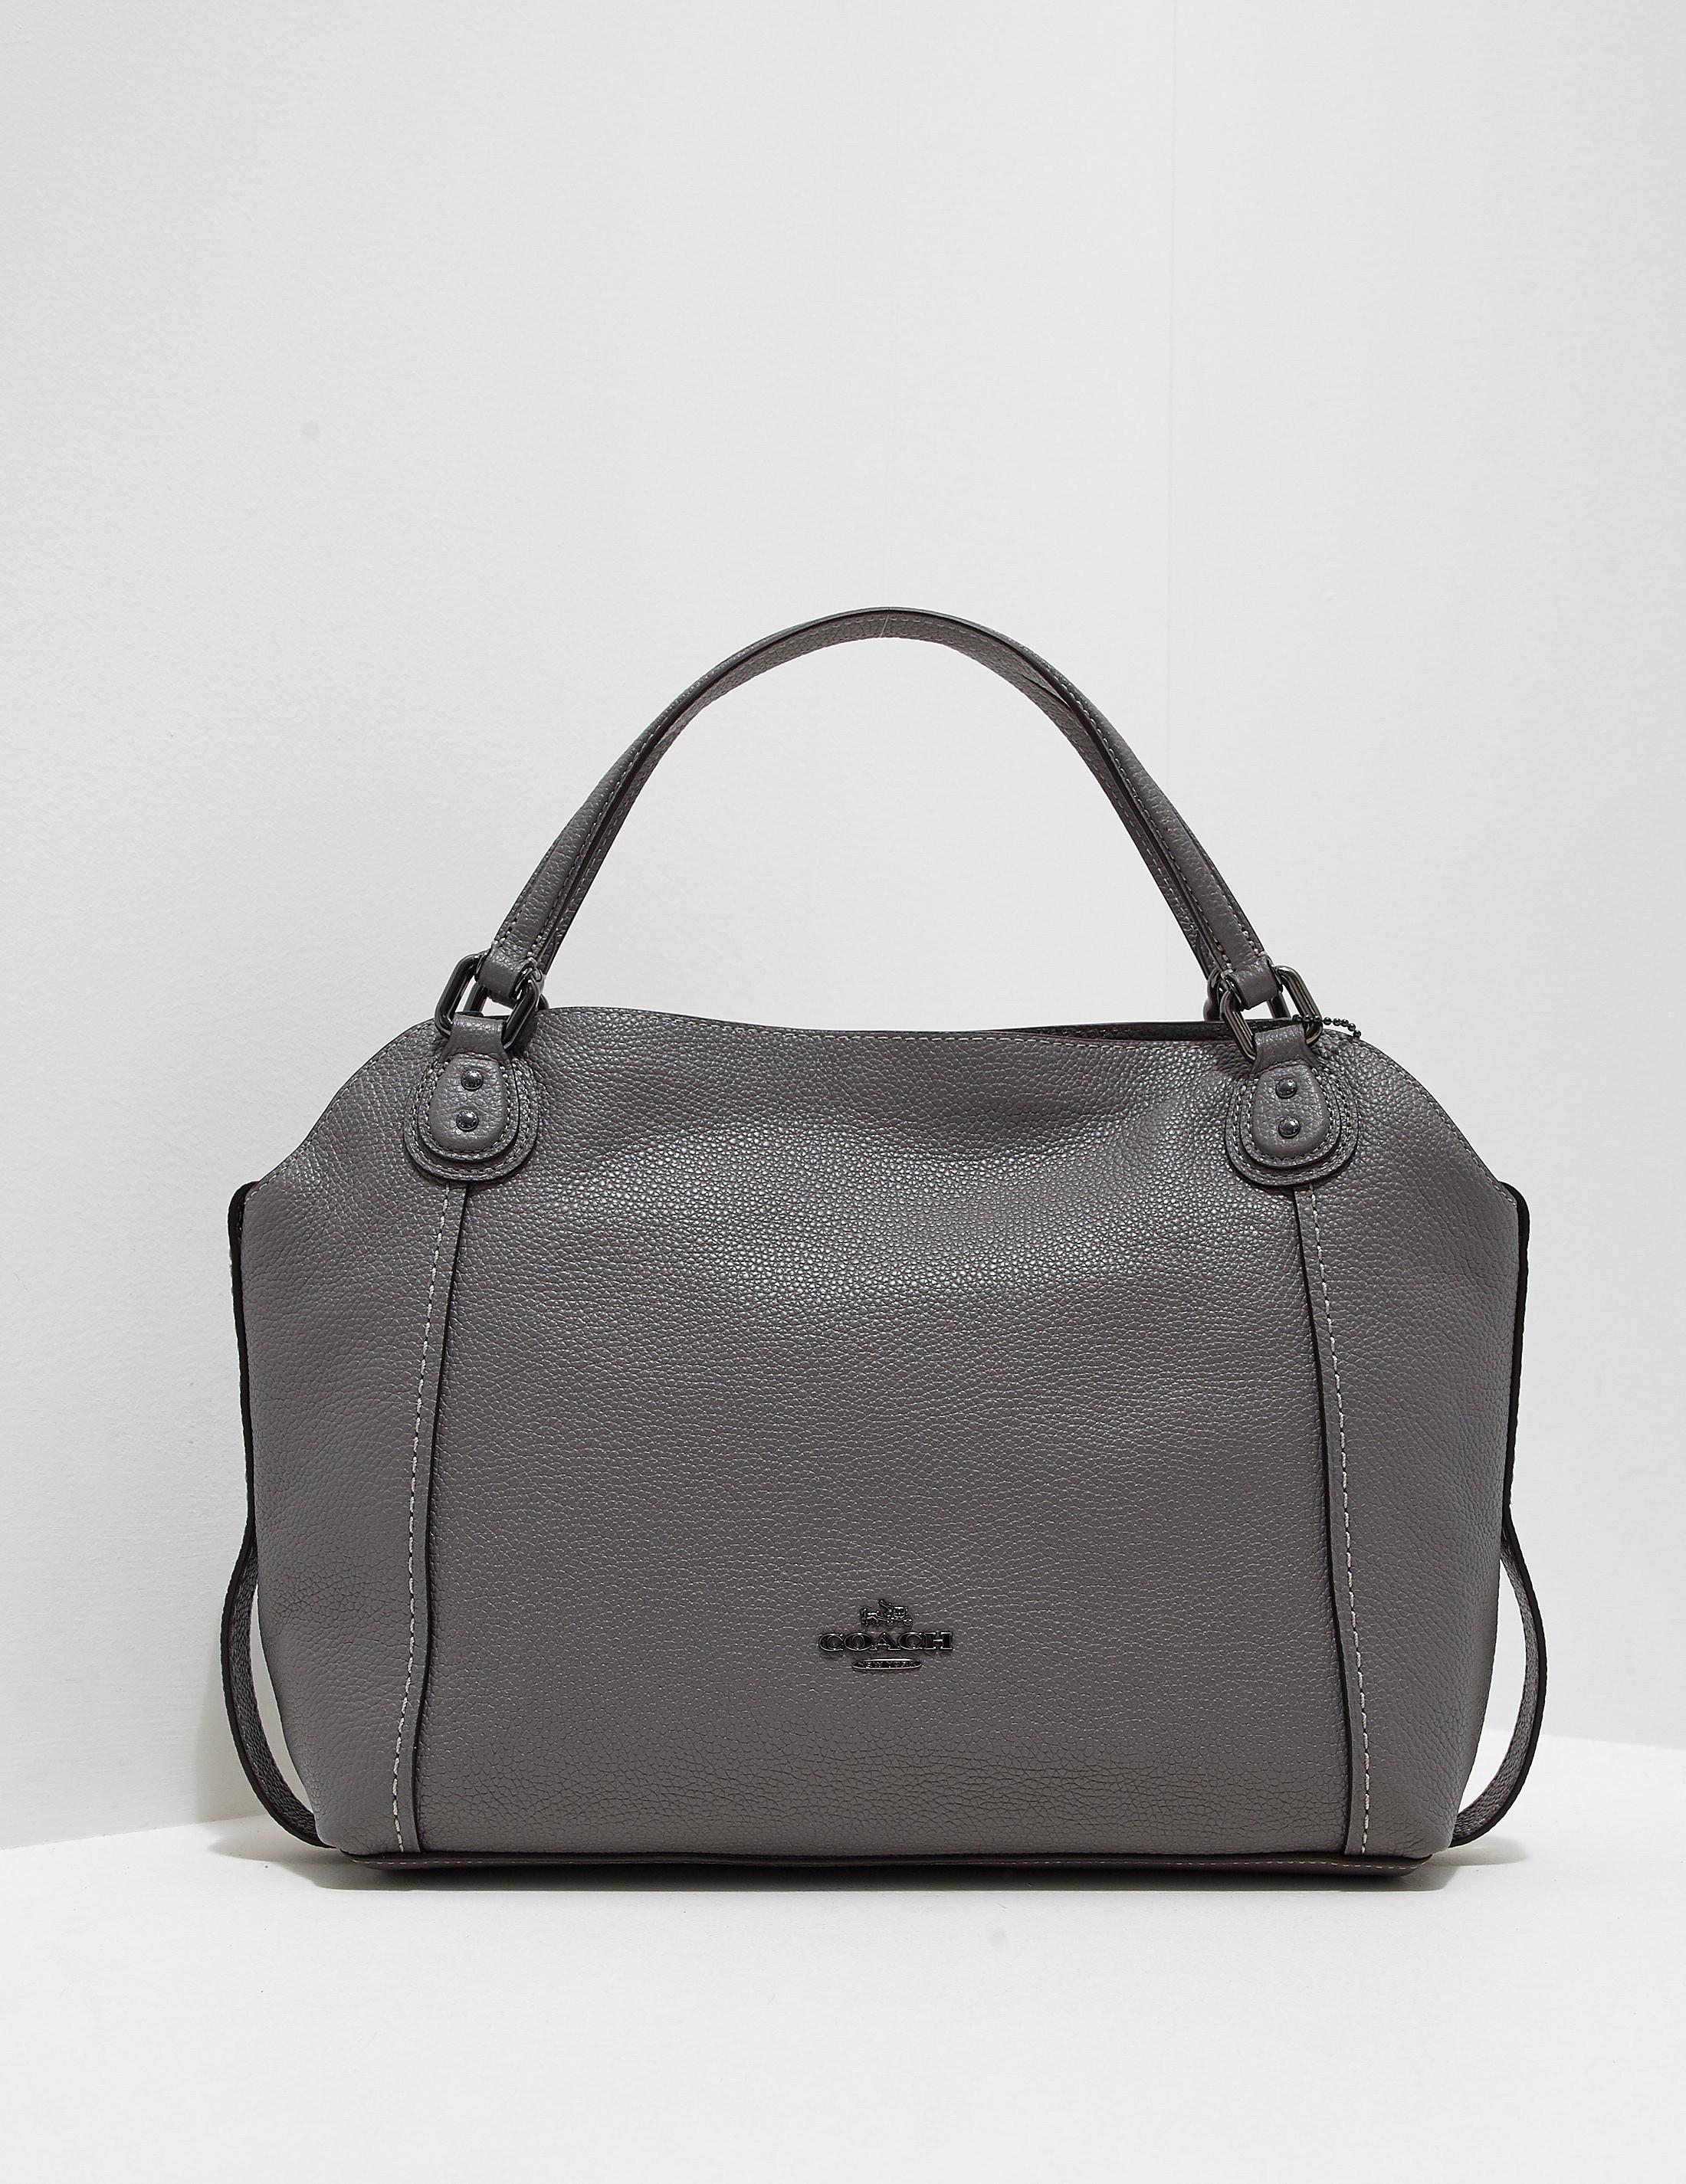 COACH Edie Handbag